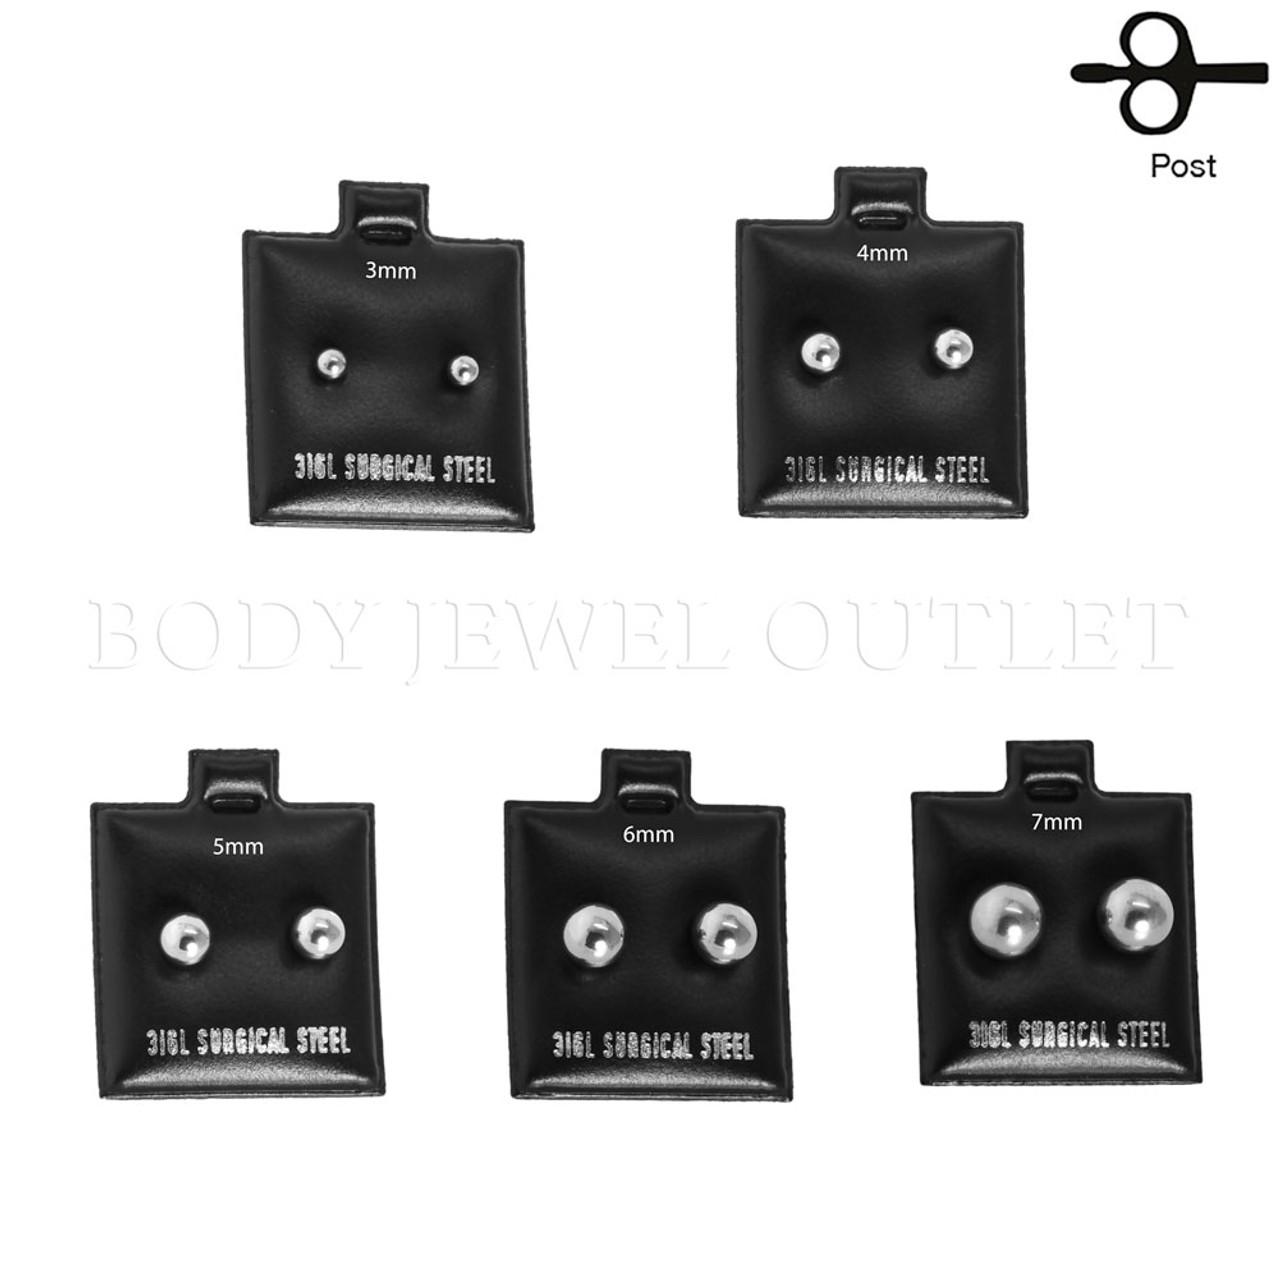 Stud Earrings Stainless Steel Ball | BodyJewelOutlet